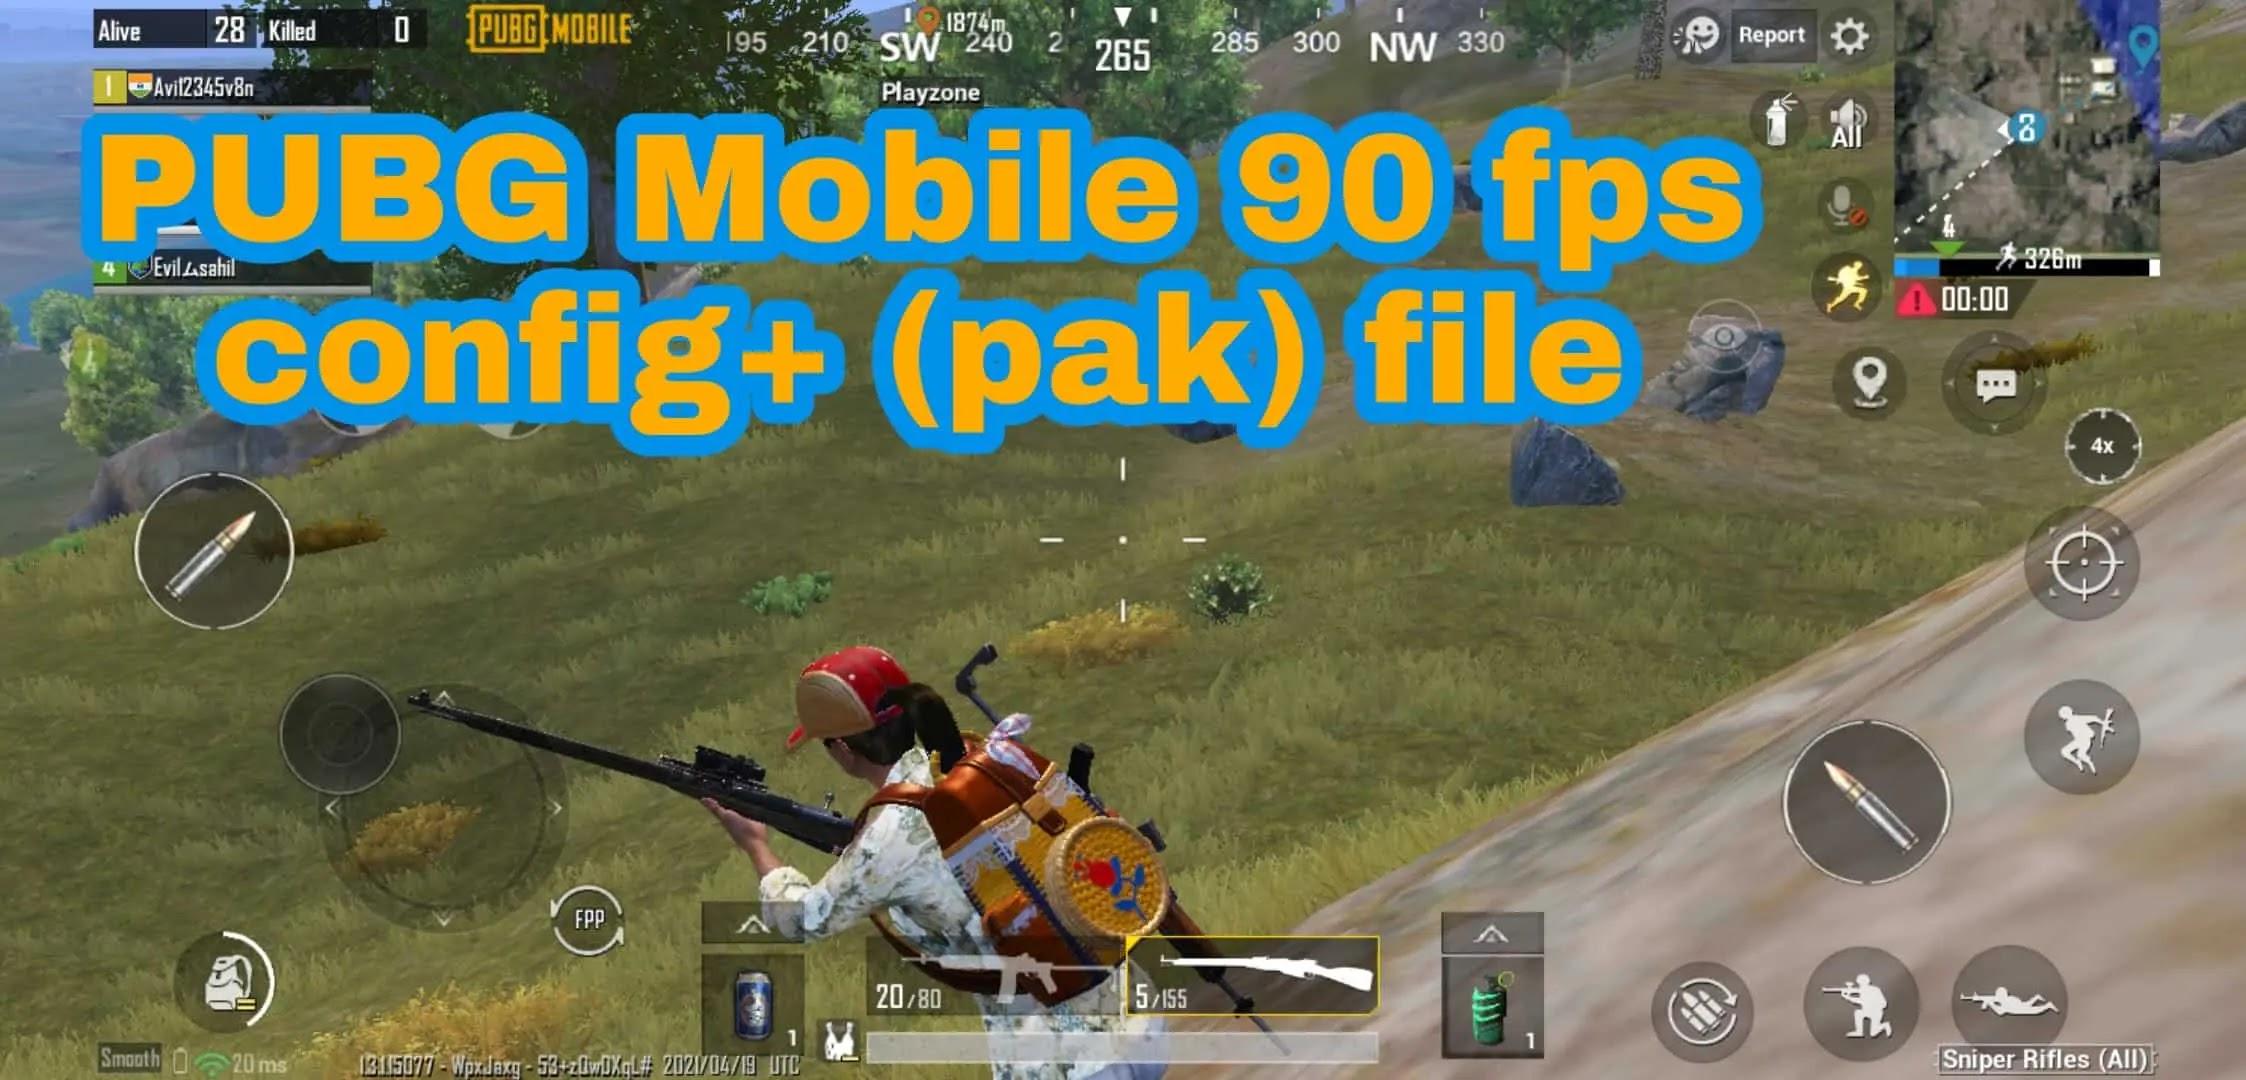 pubg mobile 90 fps config file download